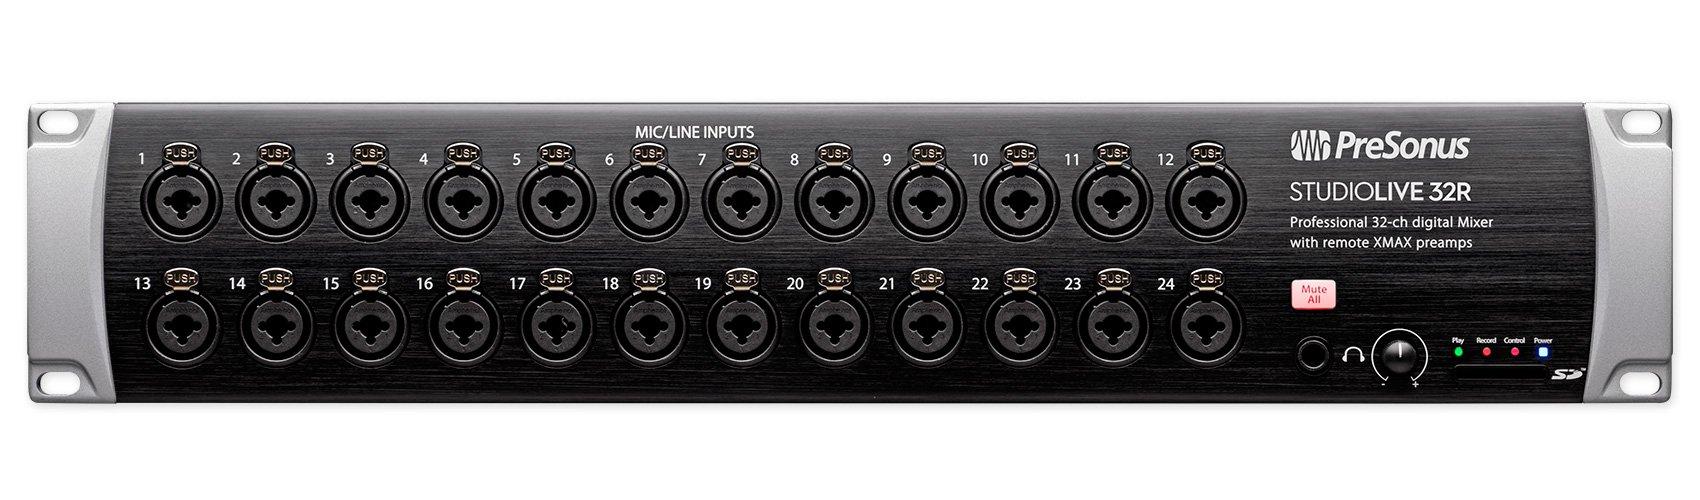 PreSonus StudioLive 32R 34-input, 32-channel Series III stage box and rack mixer